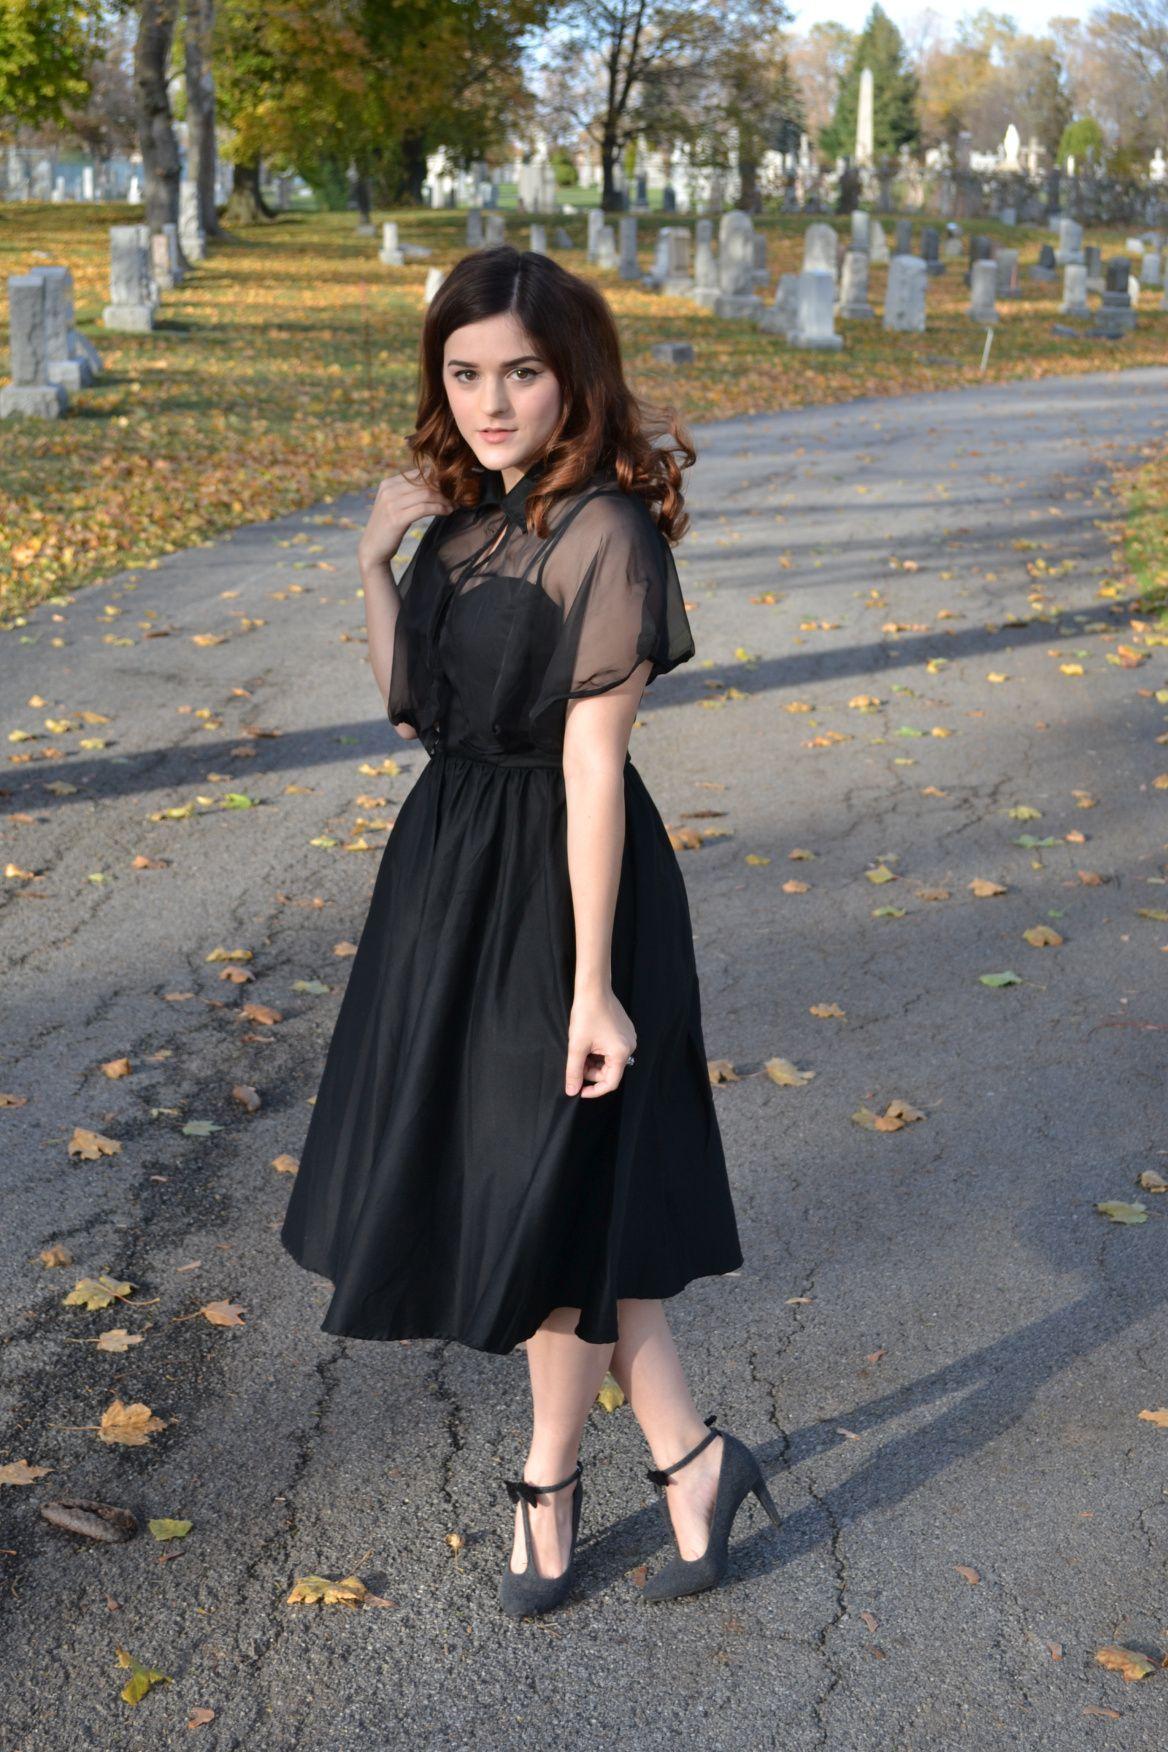 Dsc_0141 funeral attire funeral wear memorial outfits